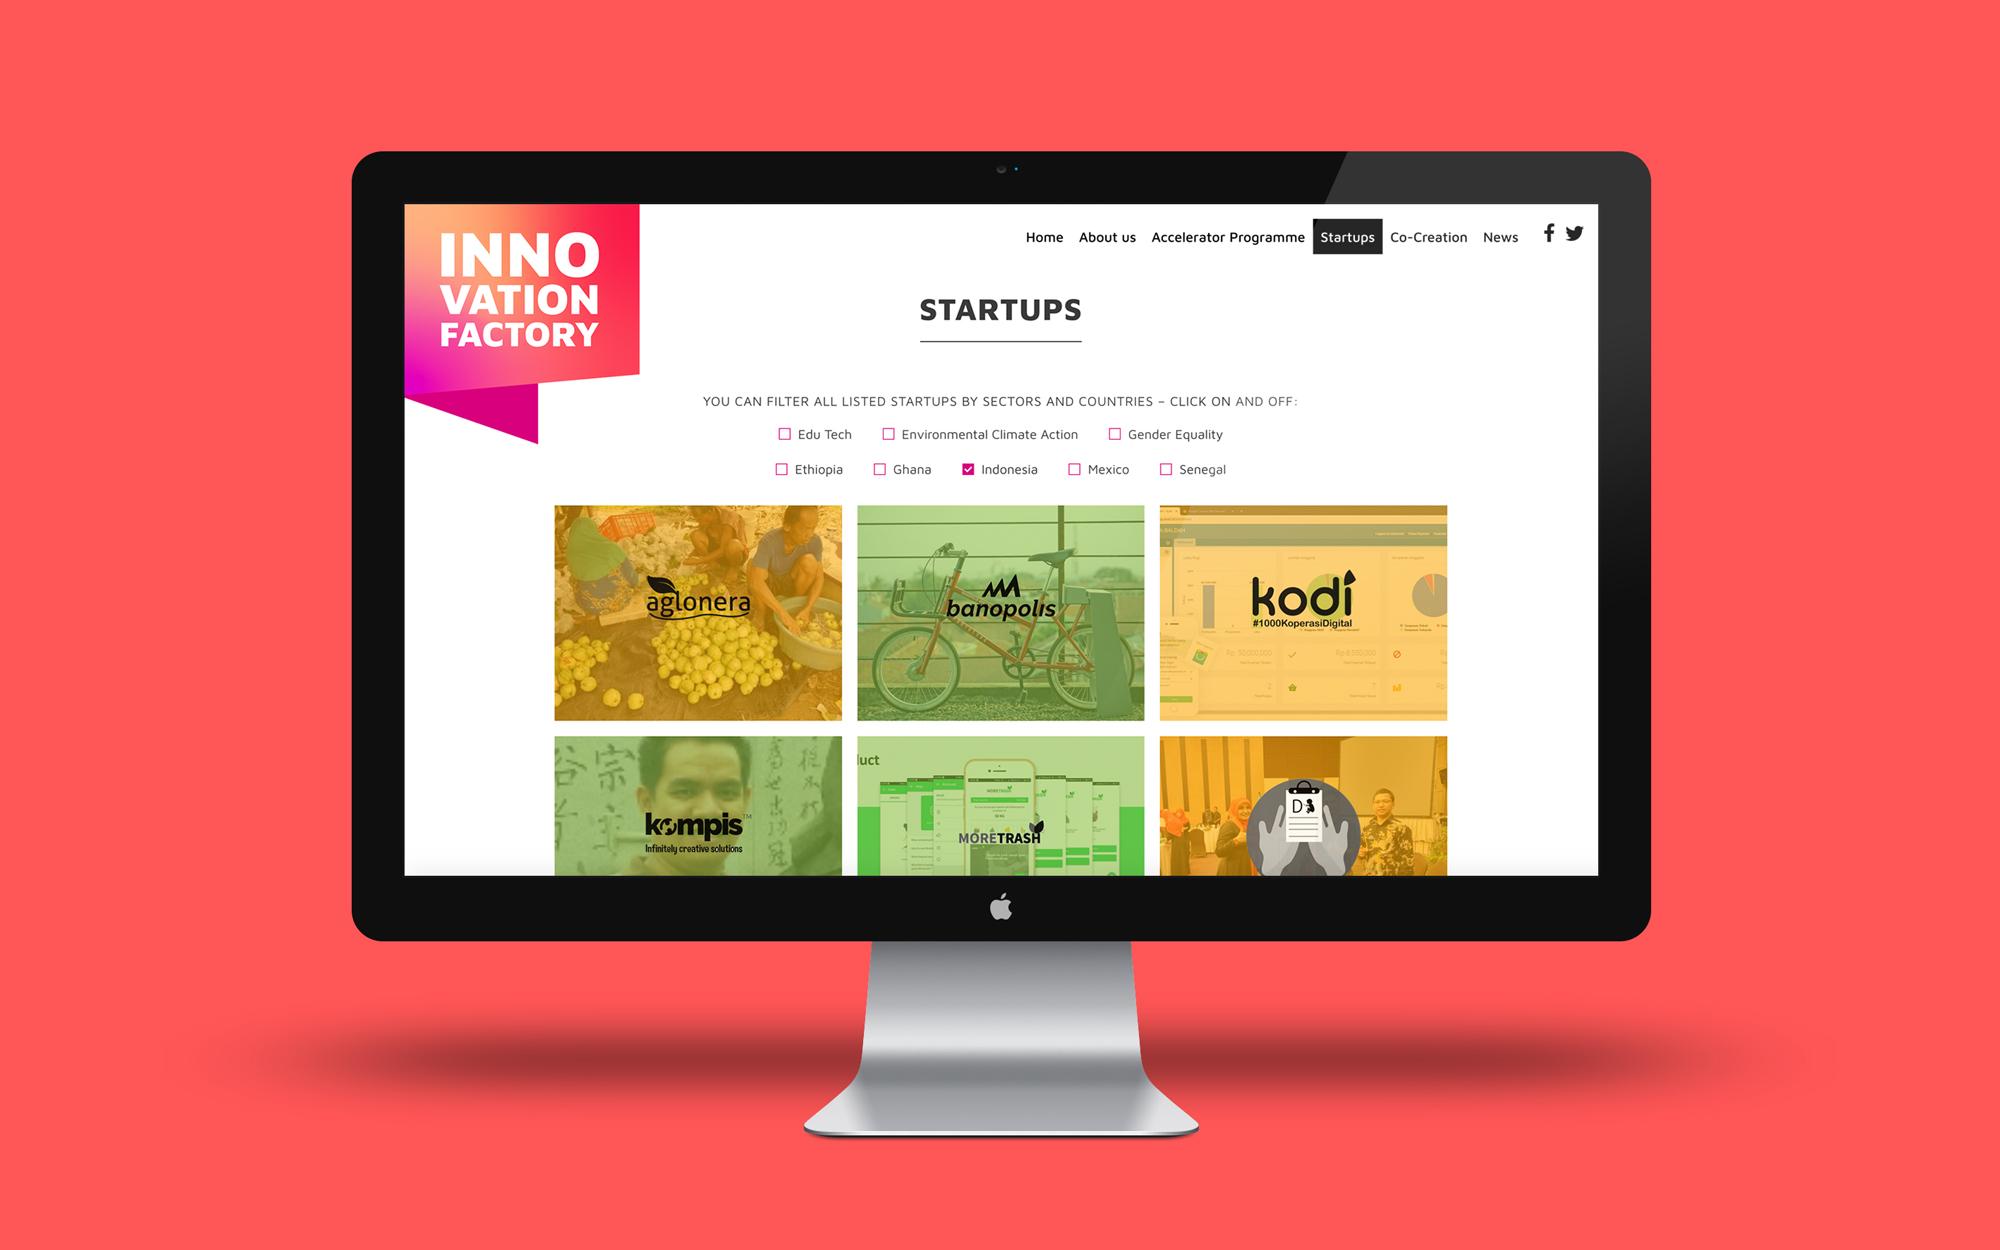 innovation factory ››› innovation-factory.info